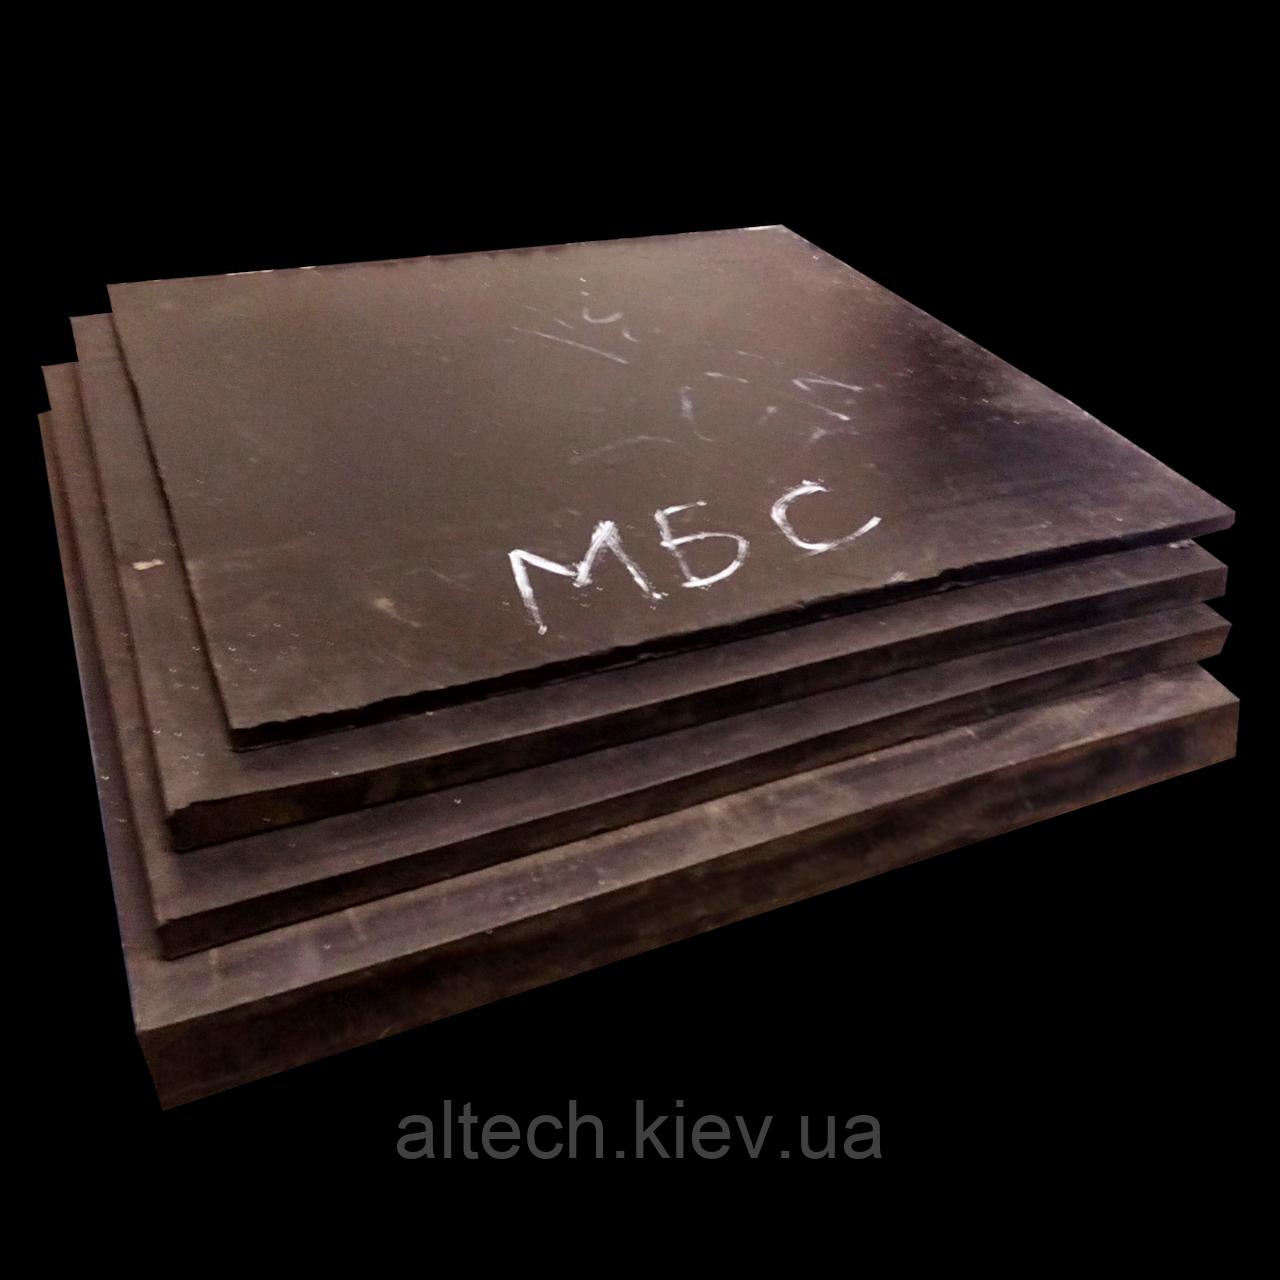 Техпластина МБС толщина 10мм. ГОСТ 7338-90  листах - ООО «ПКФ «Алтех» в Киеве